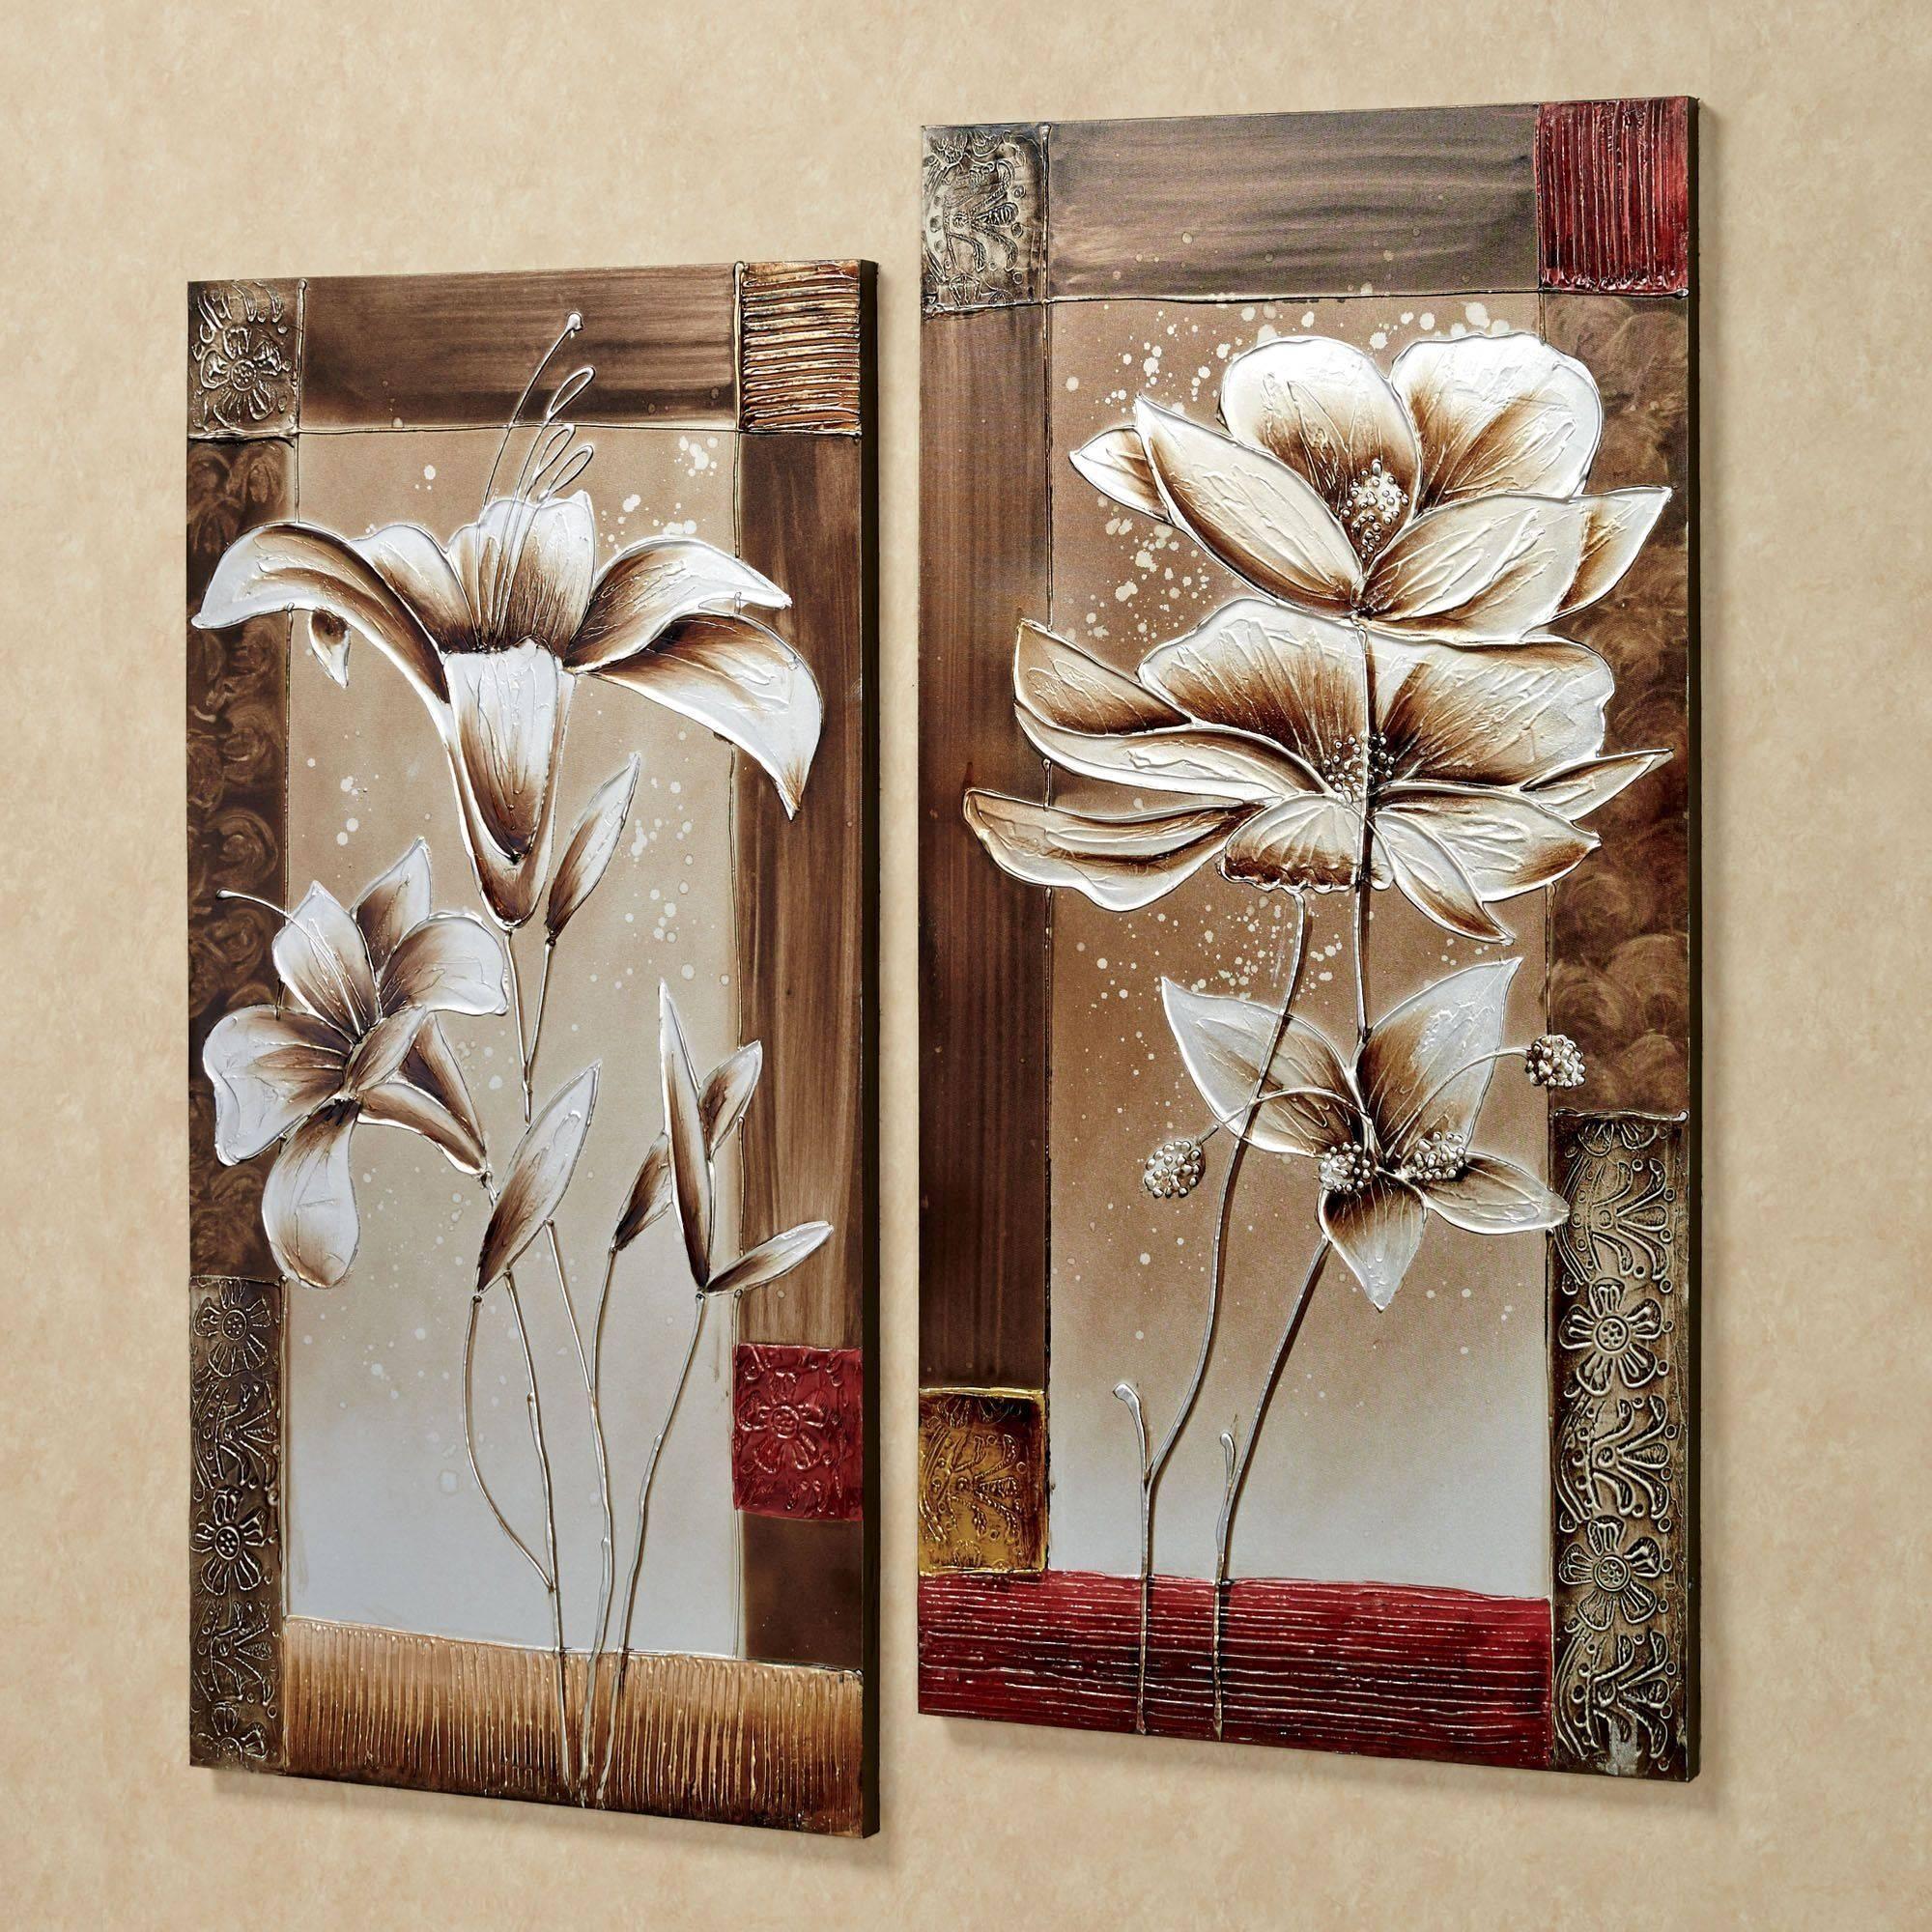 Decor: Petals Of Spring Floral Canvas Wall Art Set In Most Up To Date Canvas Wall Art Sets Of (View 9 of 25)